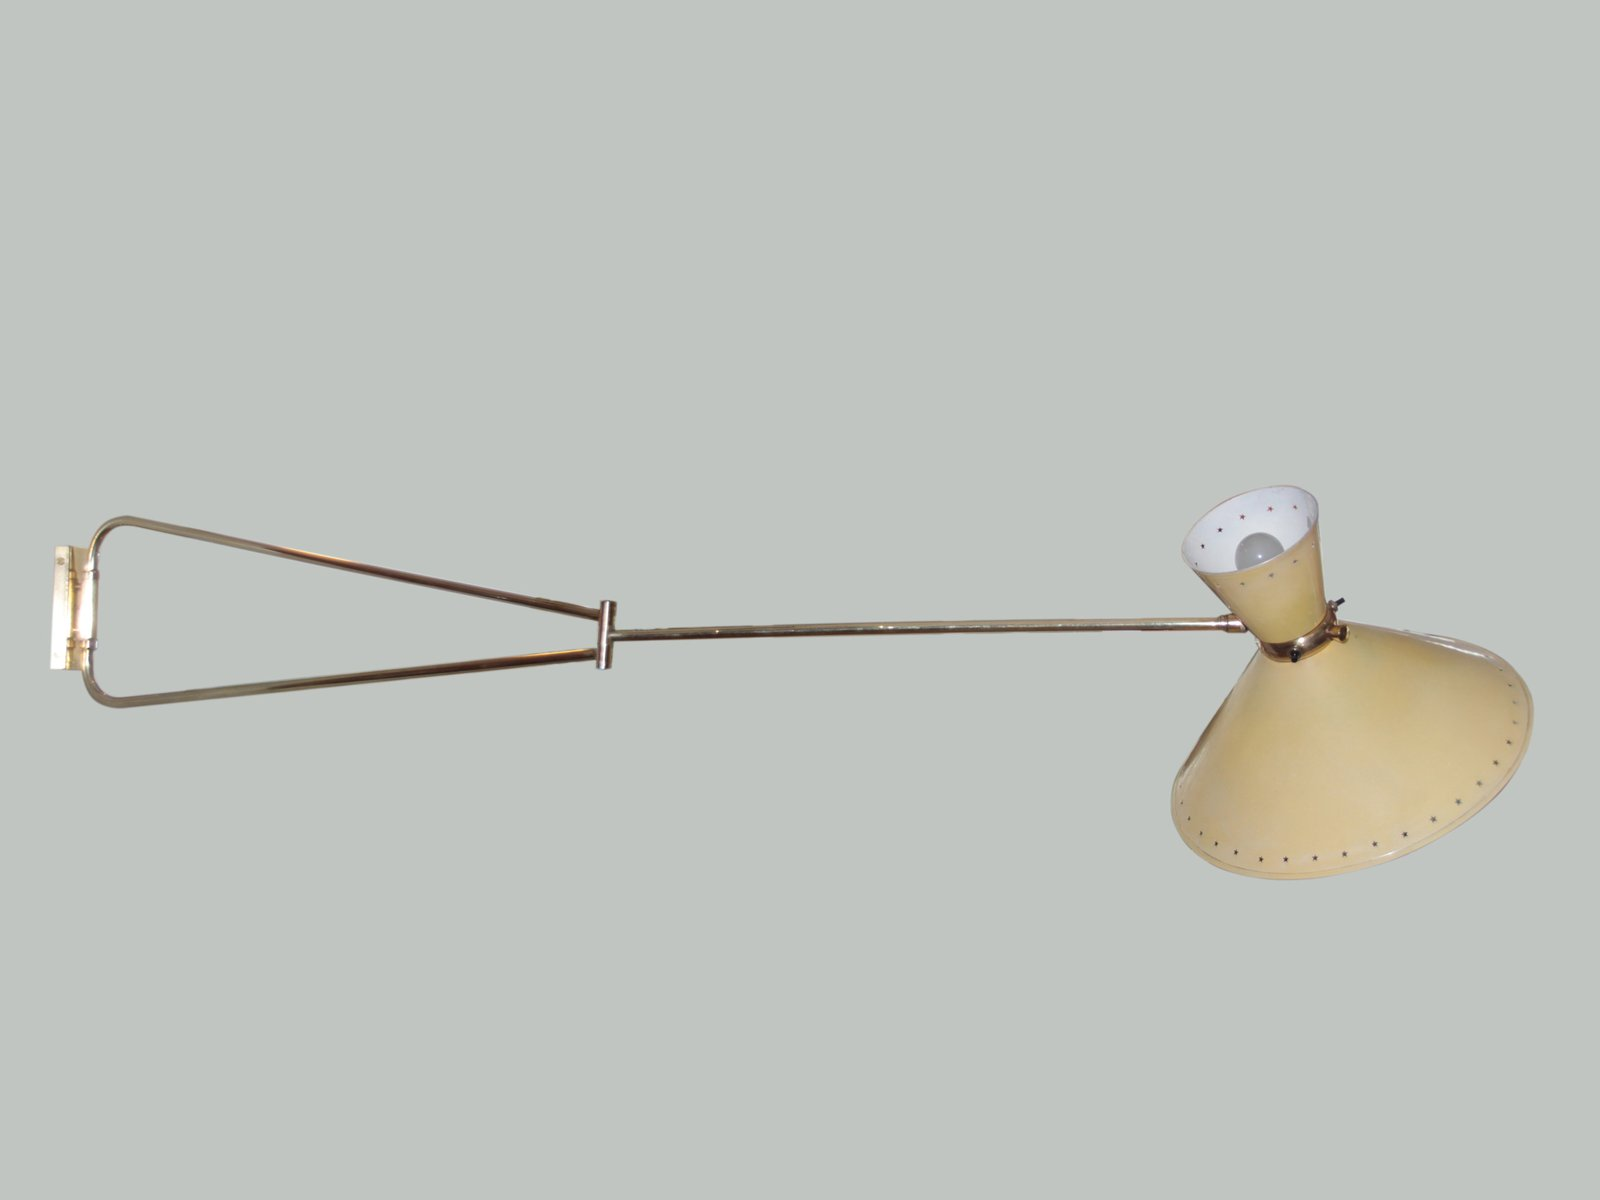 Diabolo swing arm wall light by rene mathieu for lunel 1950s for diabolo swing arm wall light by rene mathieu for lunel 1950s mozeypictures Choice Image